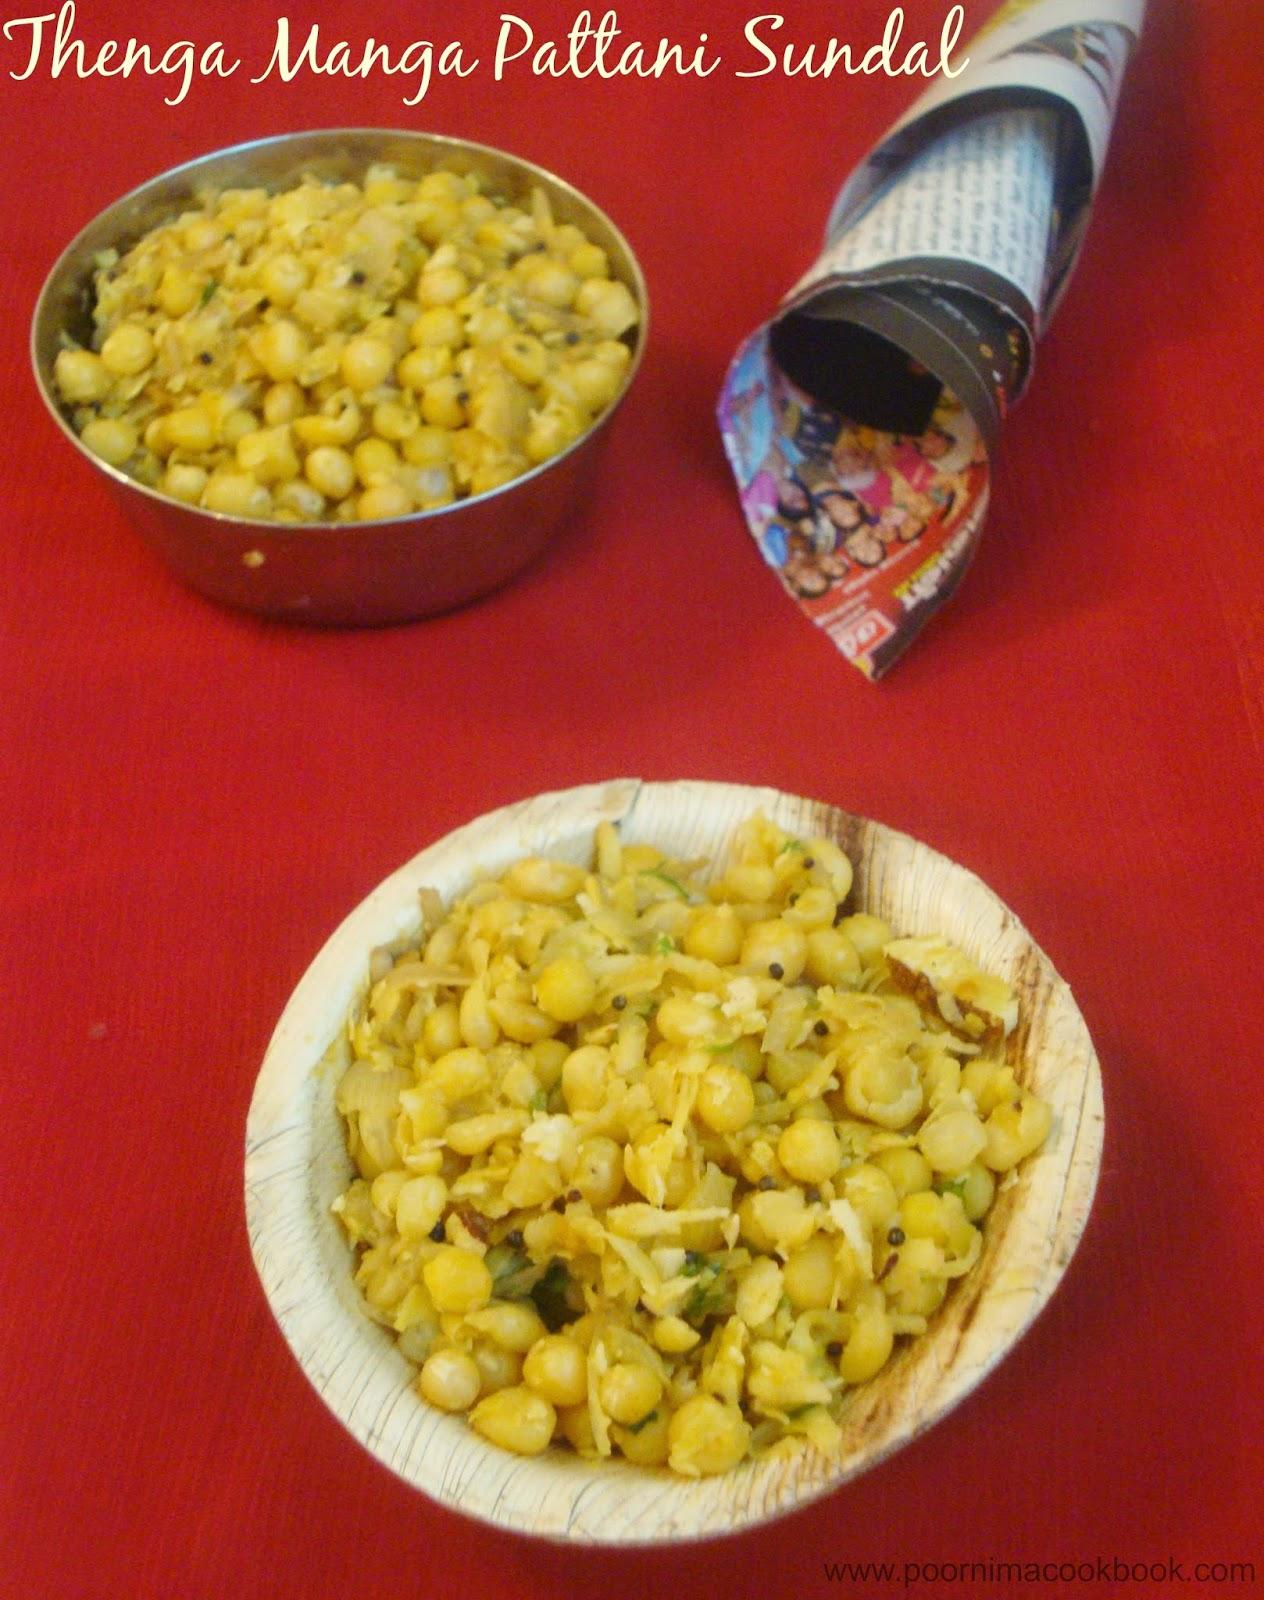 how to make pattani sundal